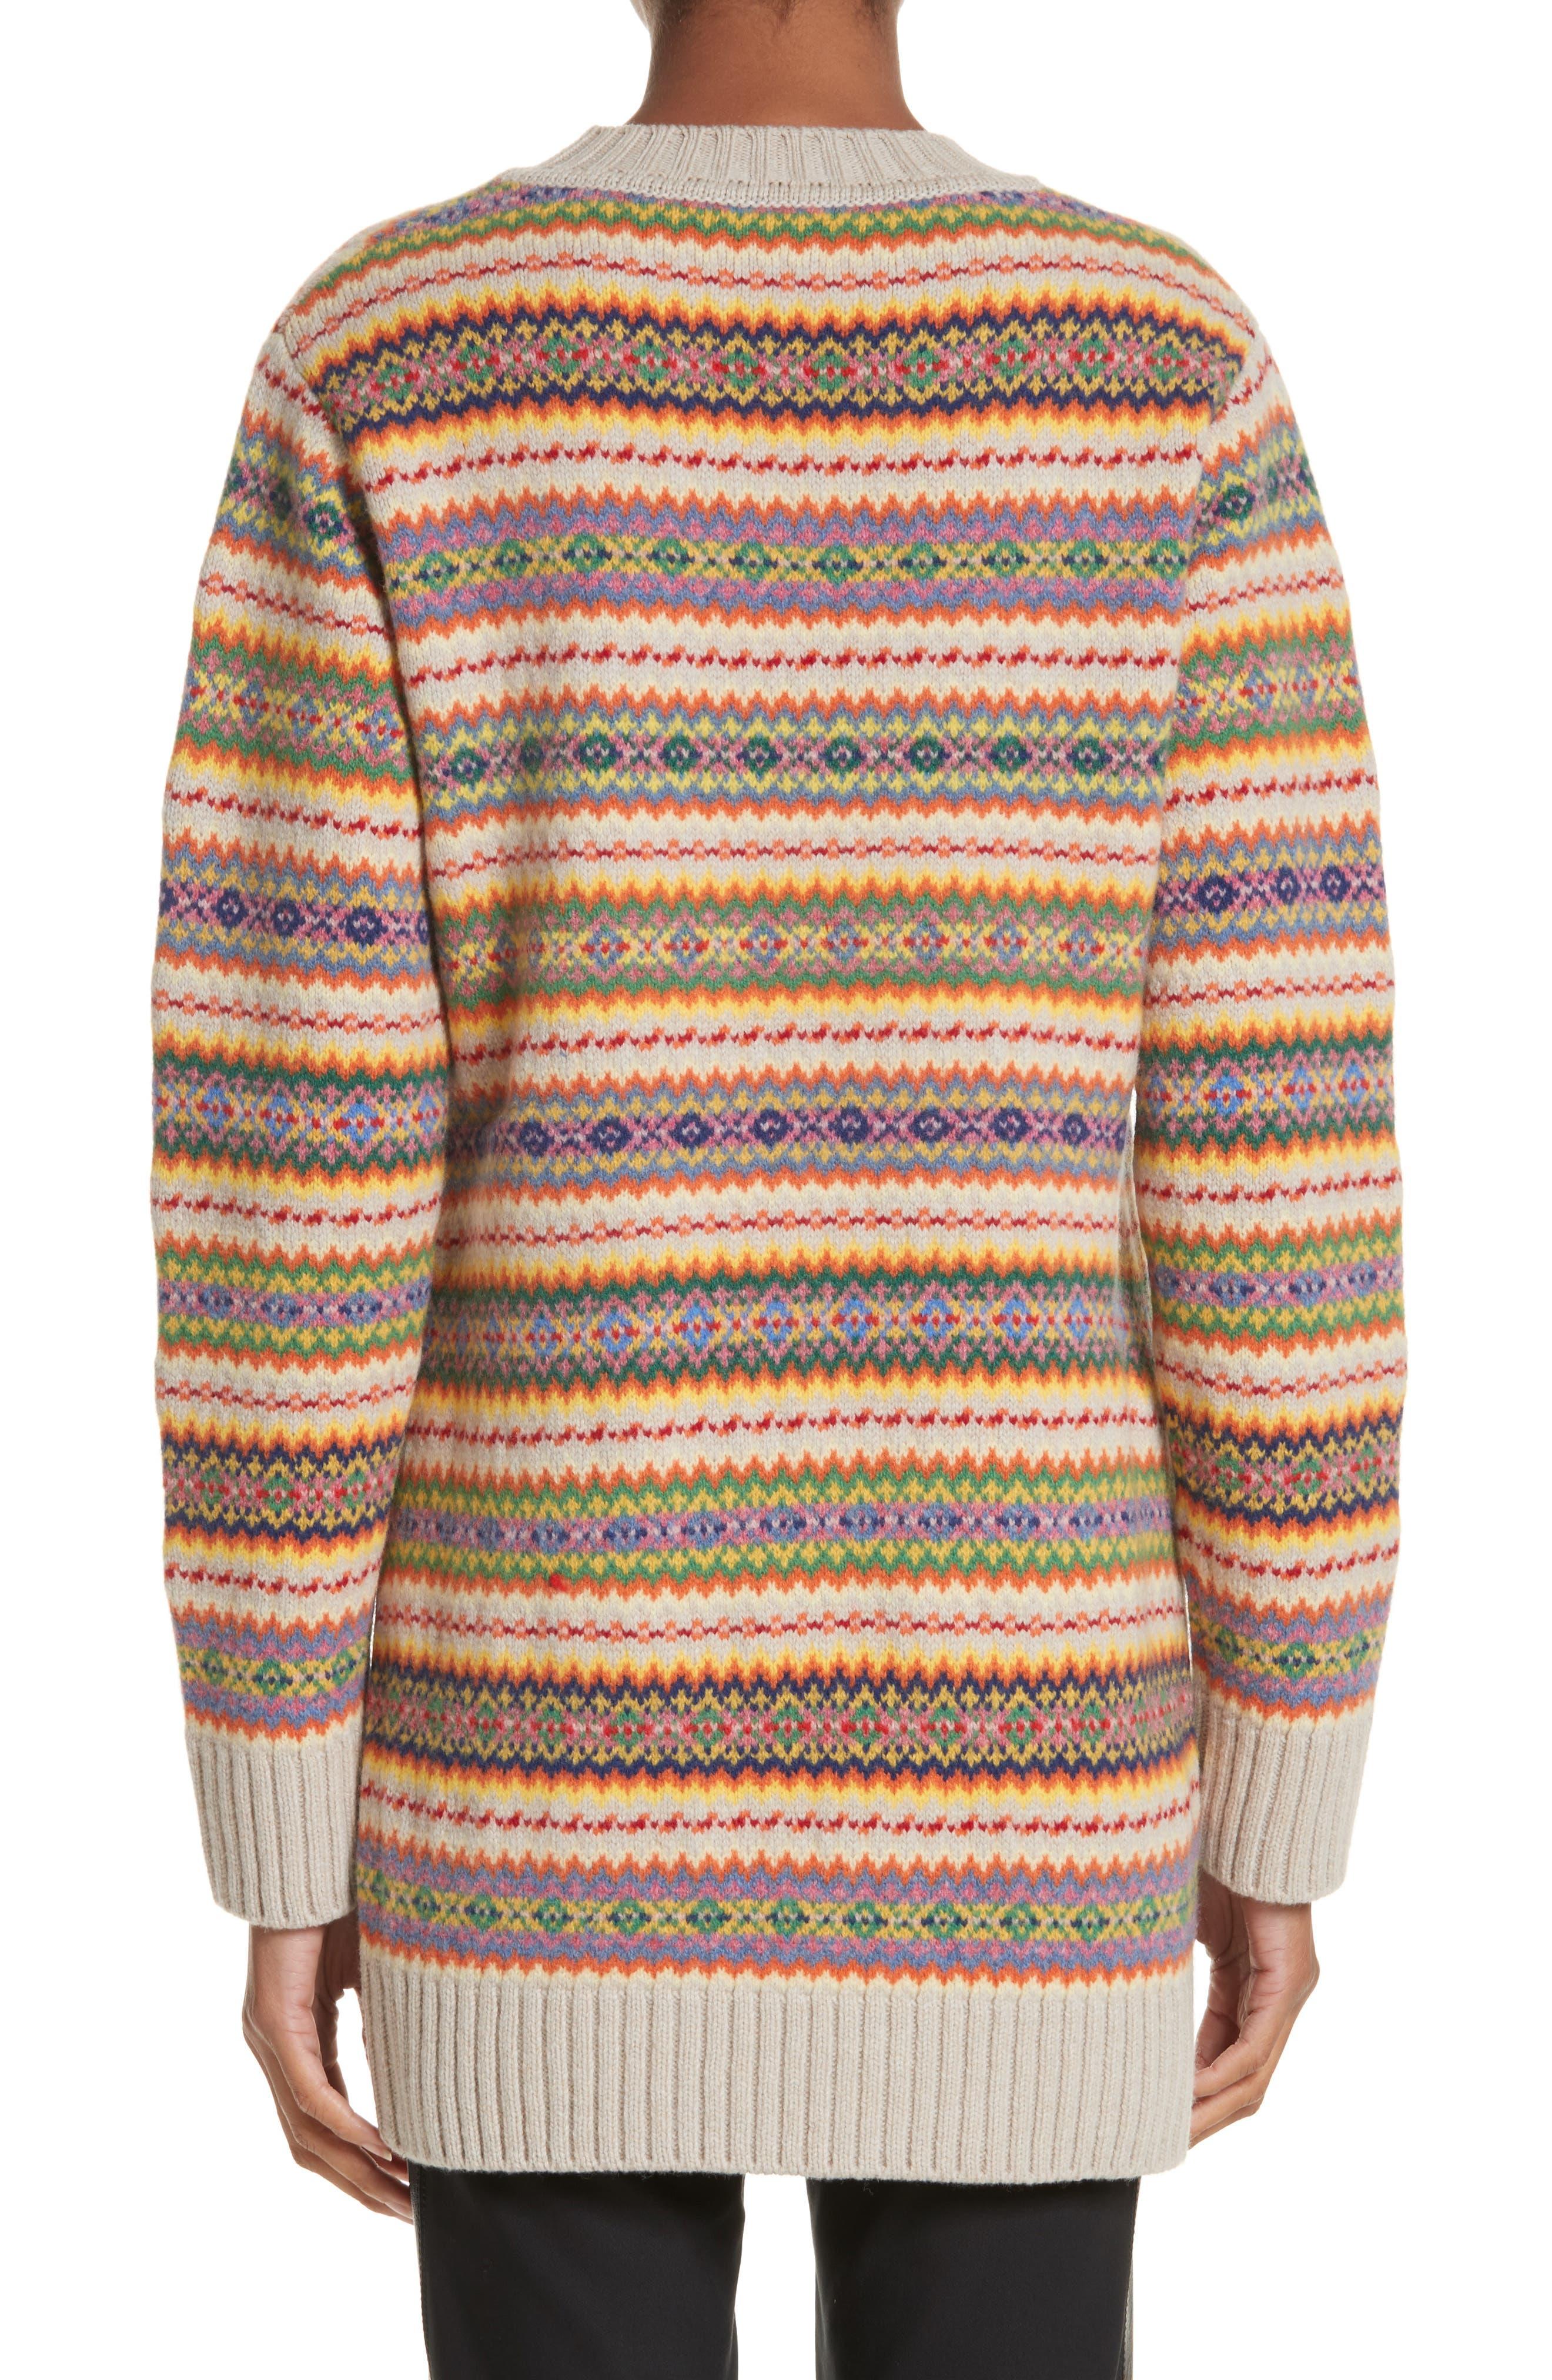 Shetland Wool Fair Isle Sweater,                             Alternate thumbnail 2, color,                             Multicolor